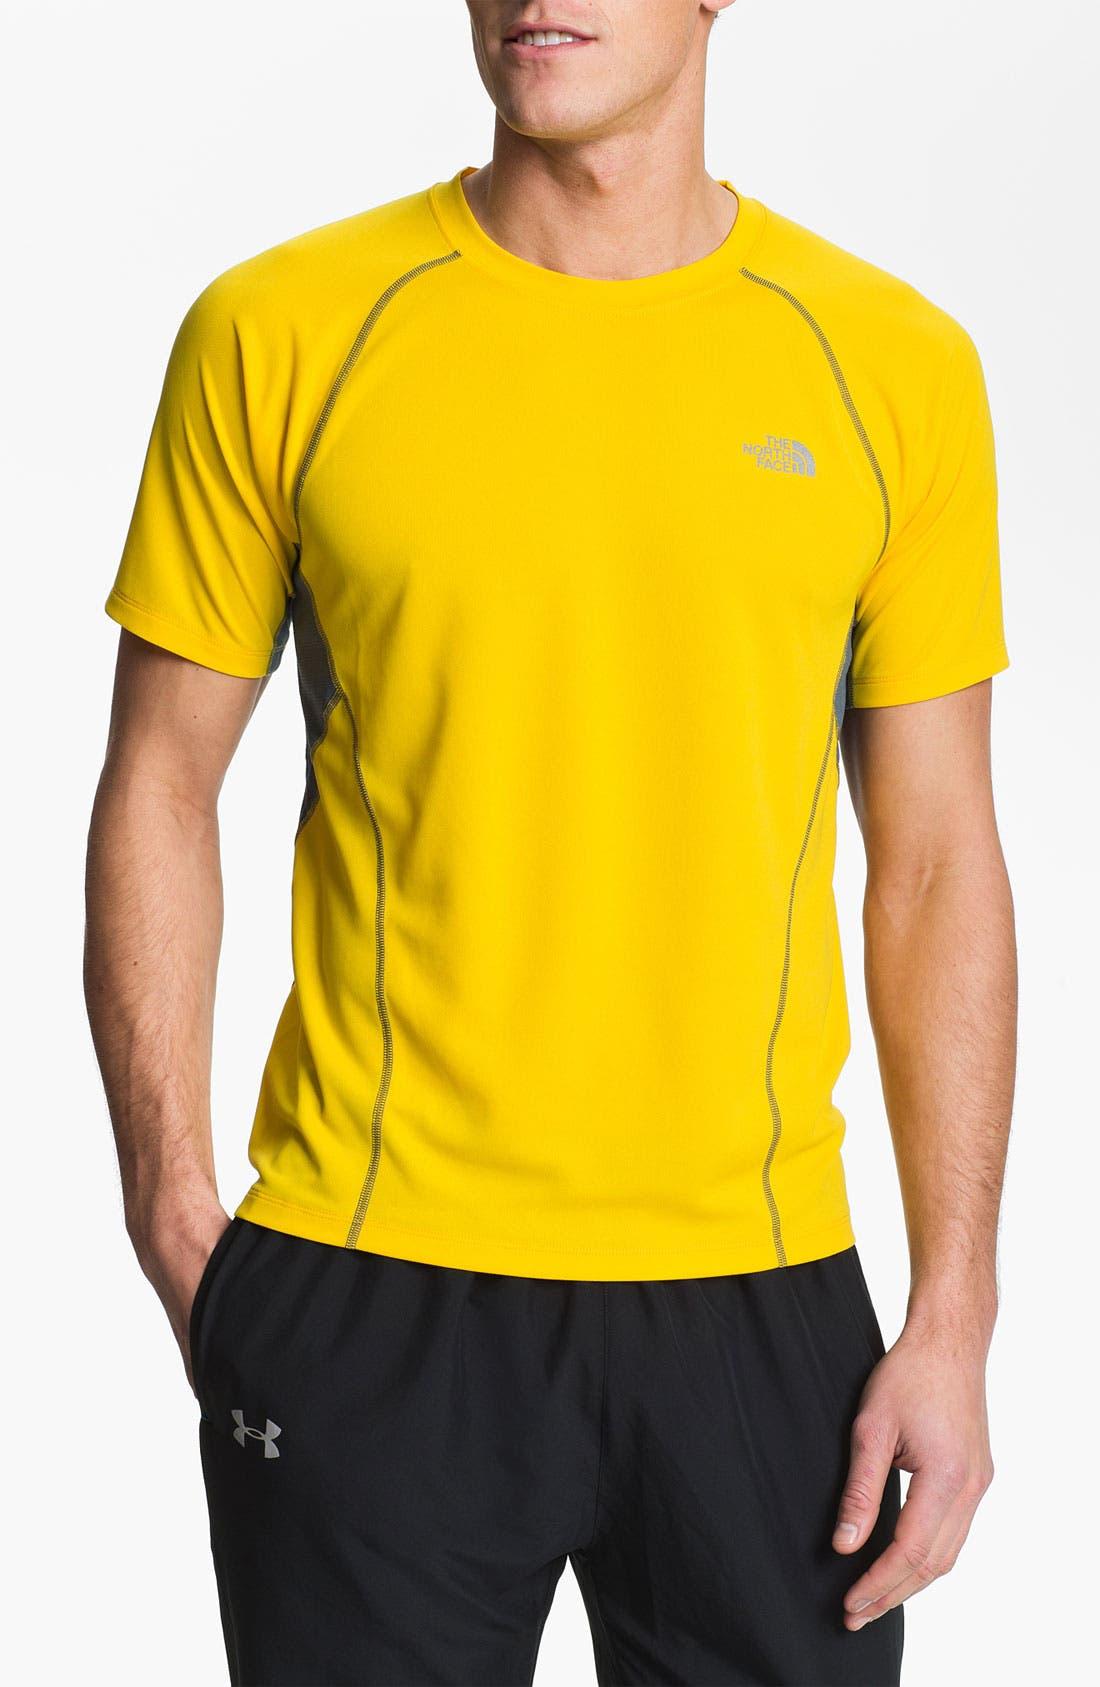 Main Image - The North Face 'GTD' T-Shirt